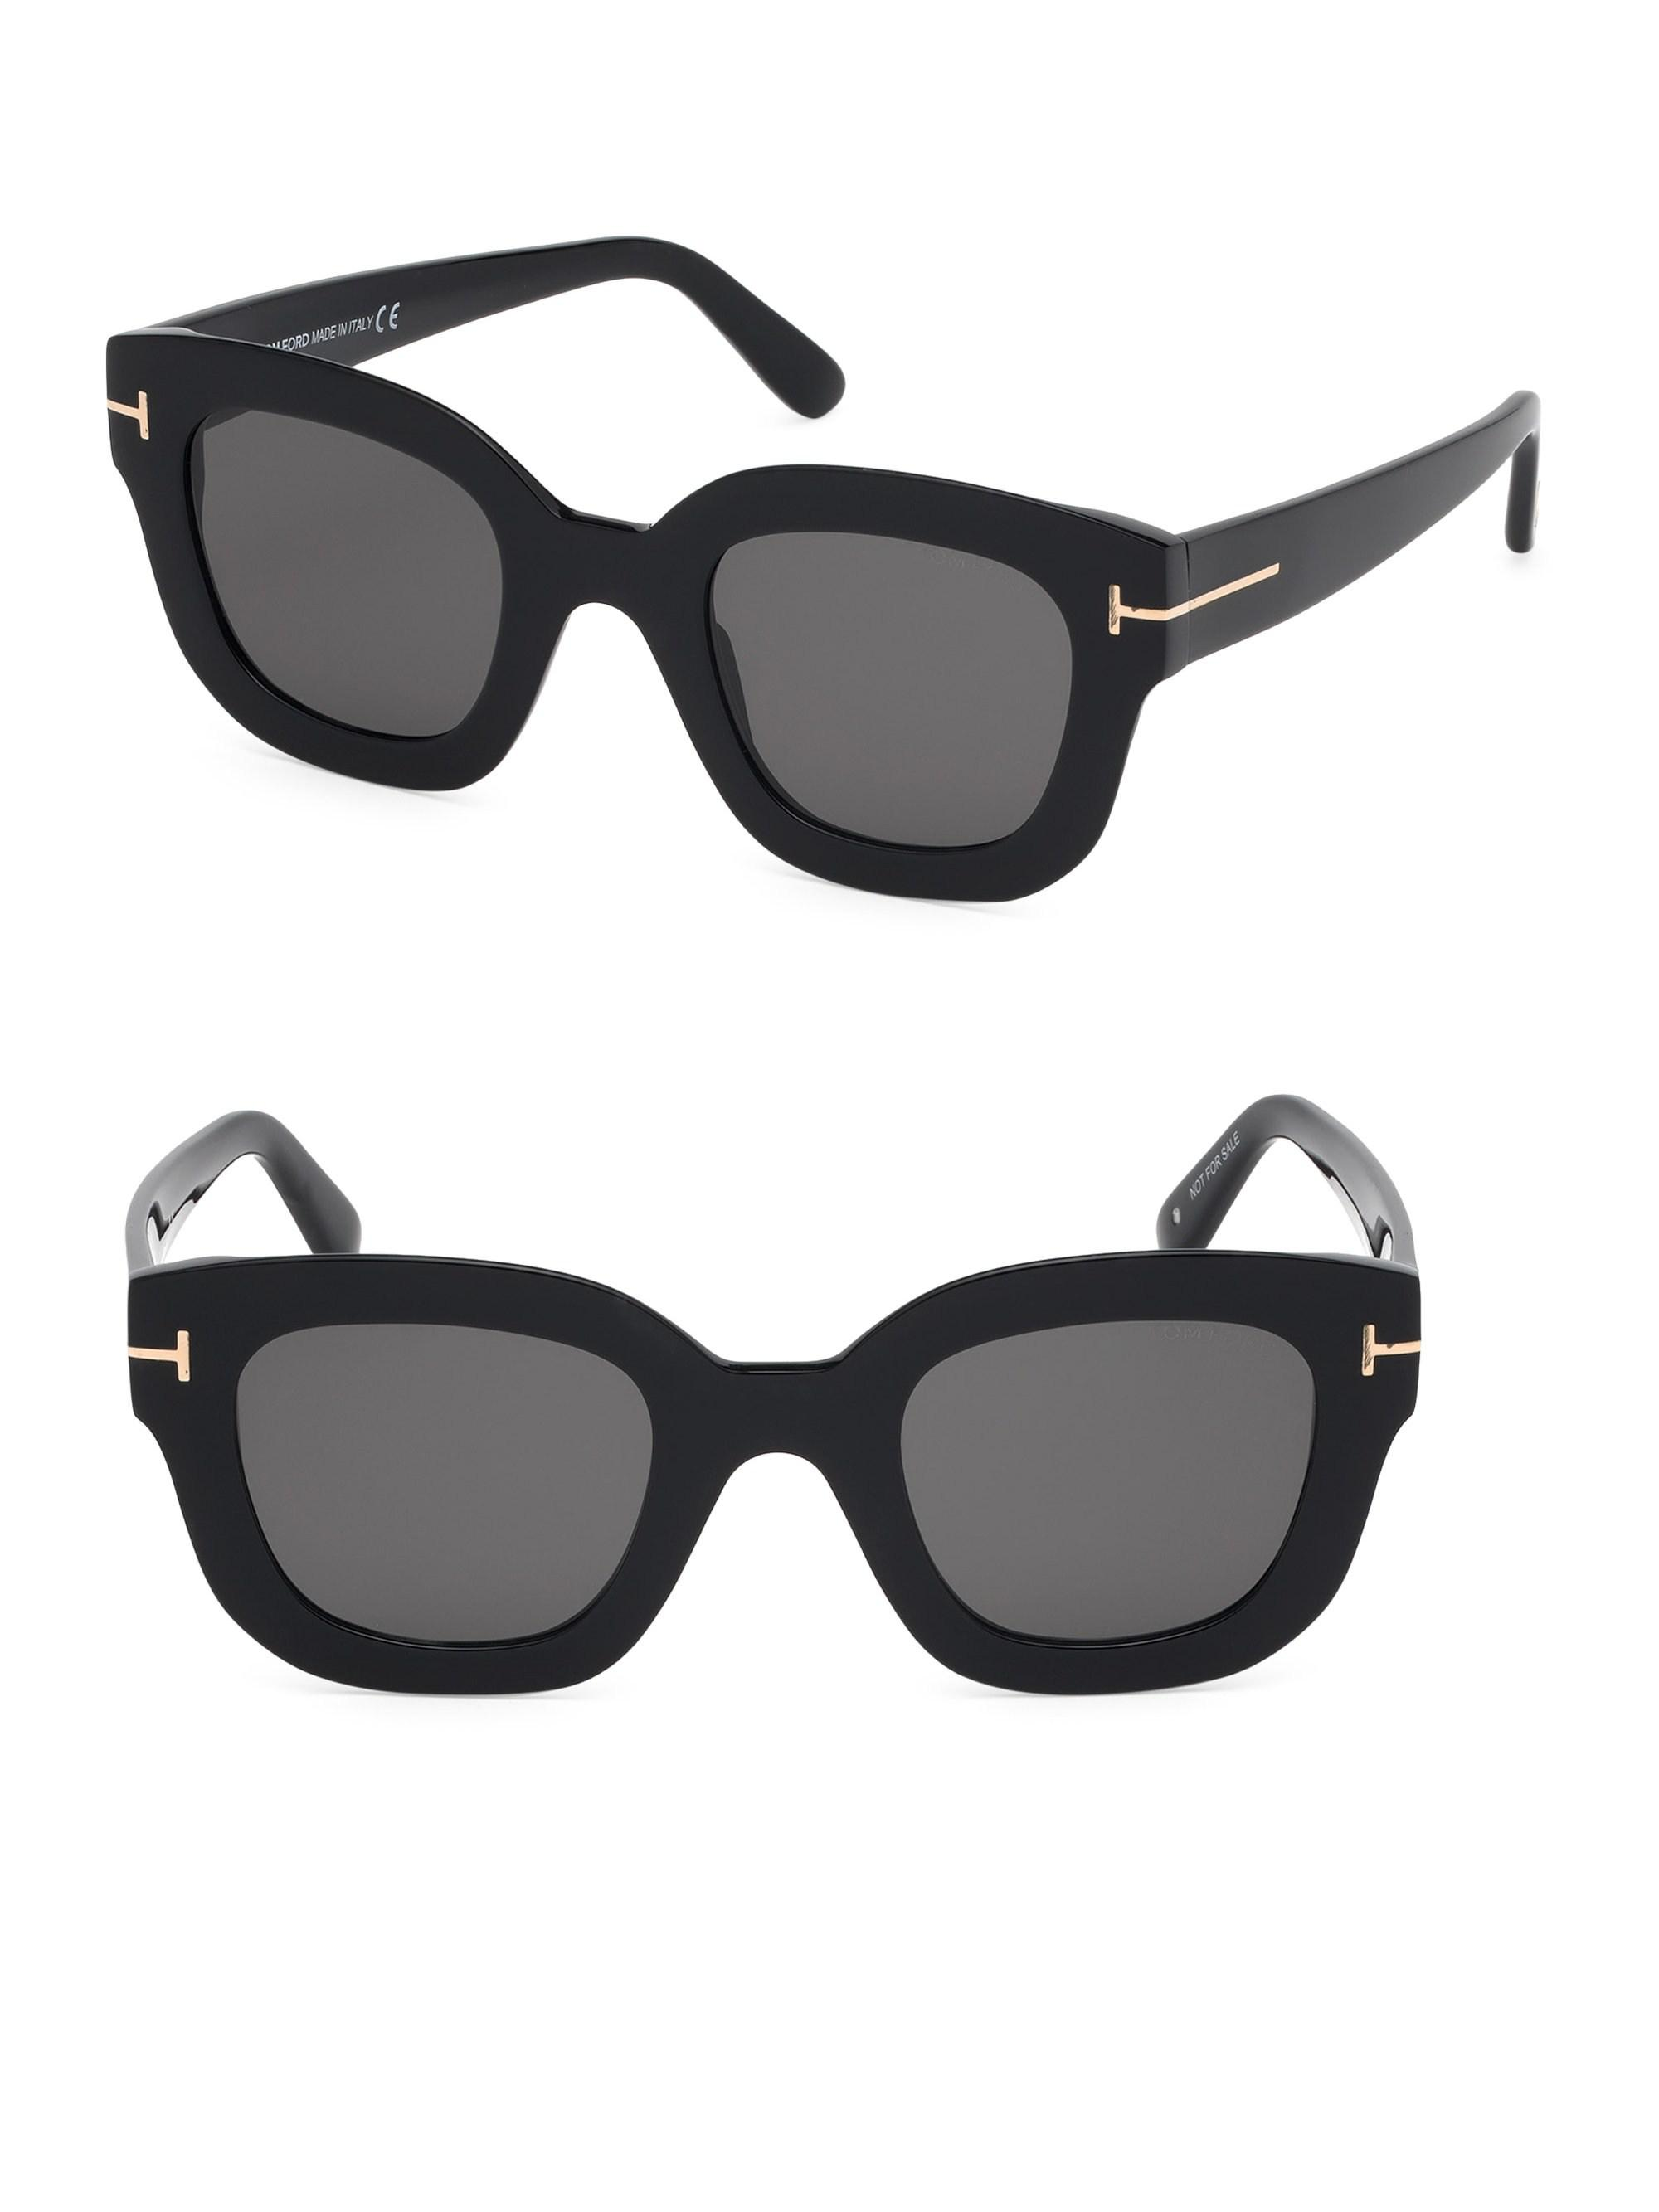 e173433dae Tom Ford Pia Black 48mm Square Sunglasses in Black - Lyst